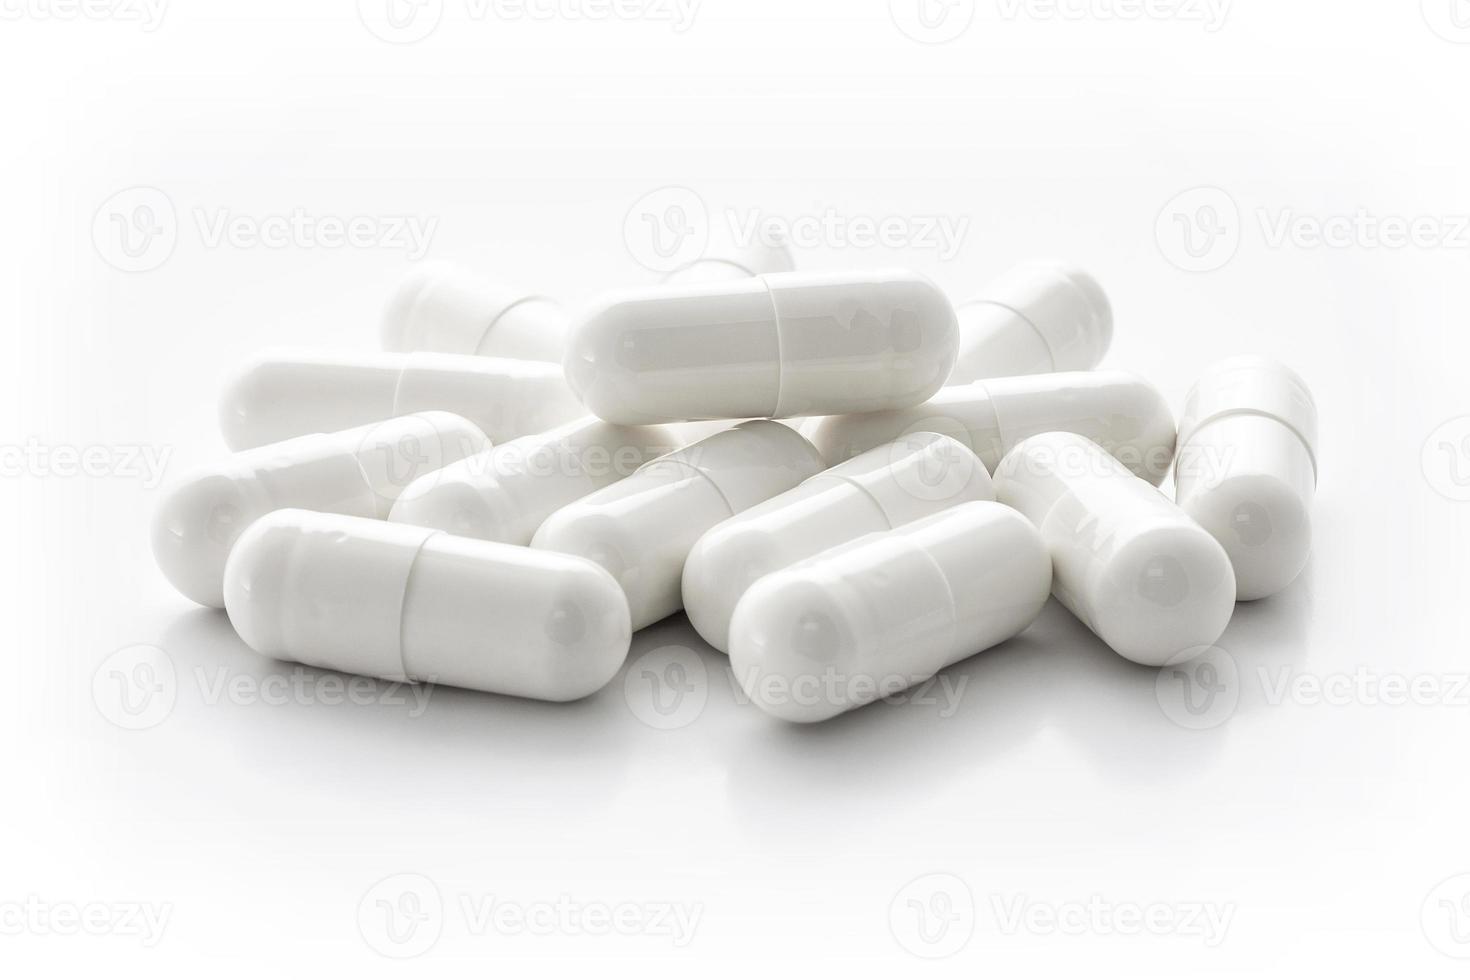 White medicine capsules photo